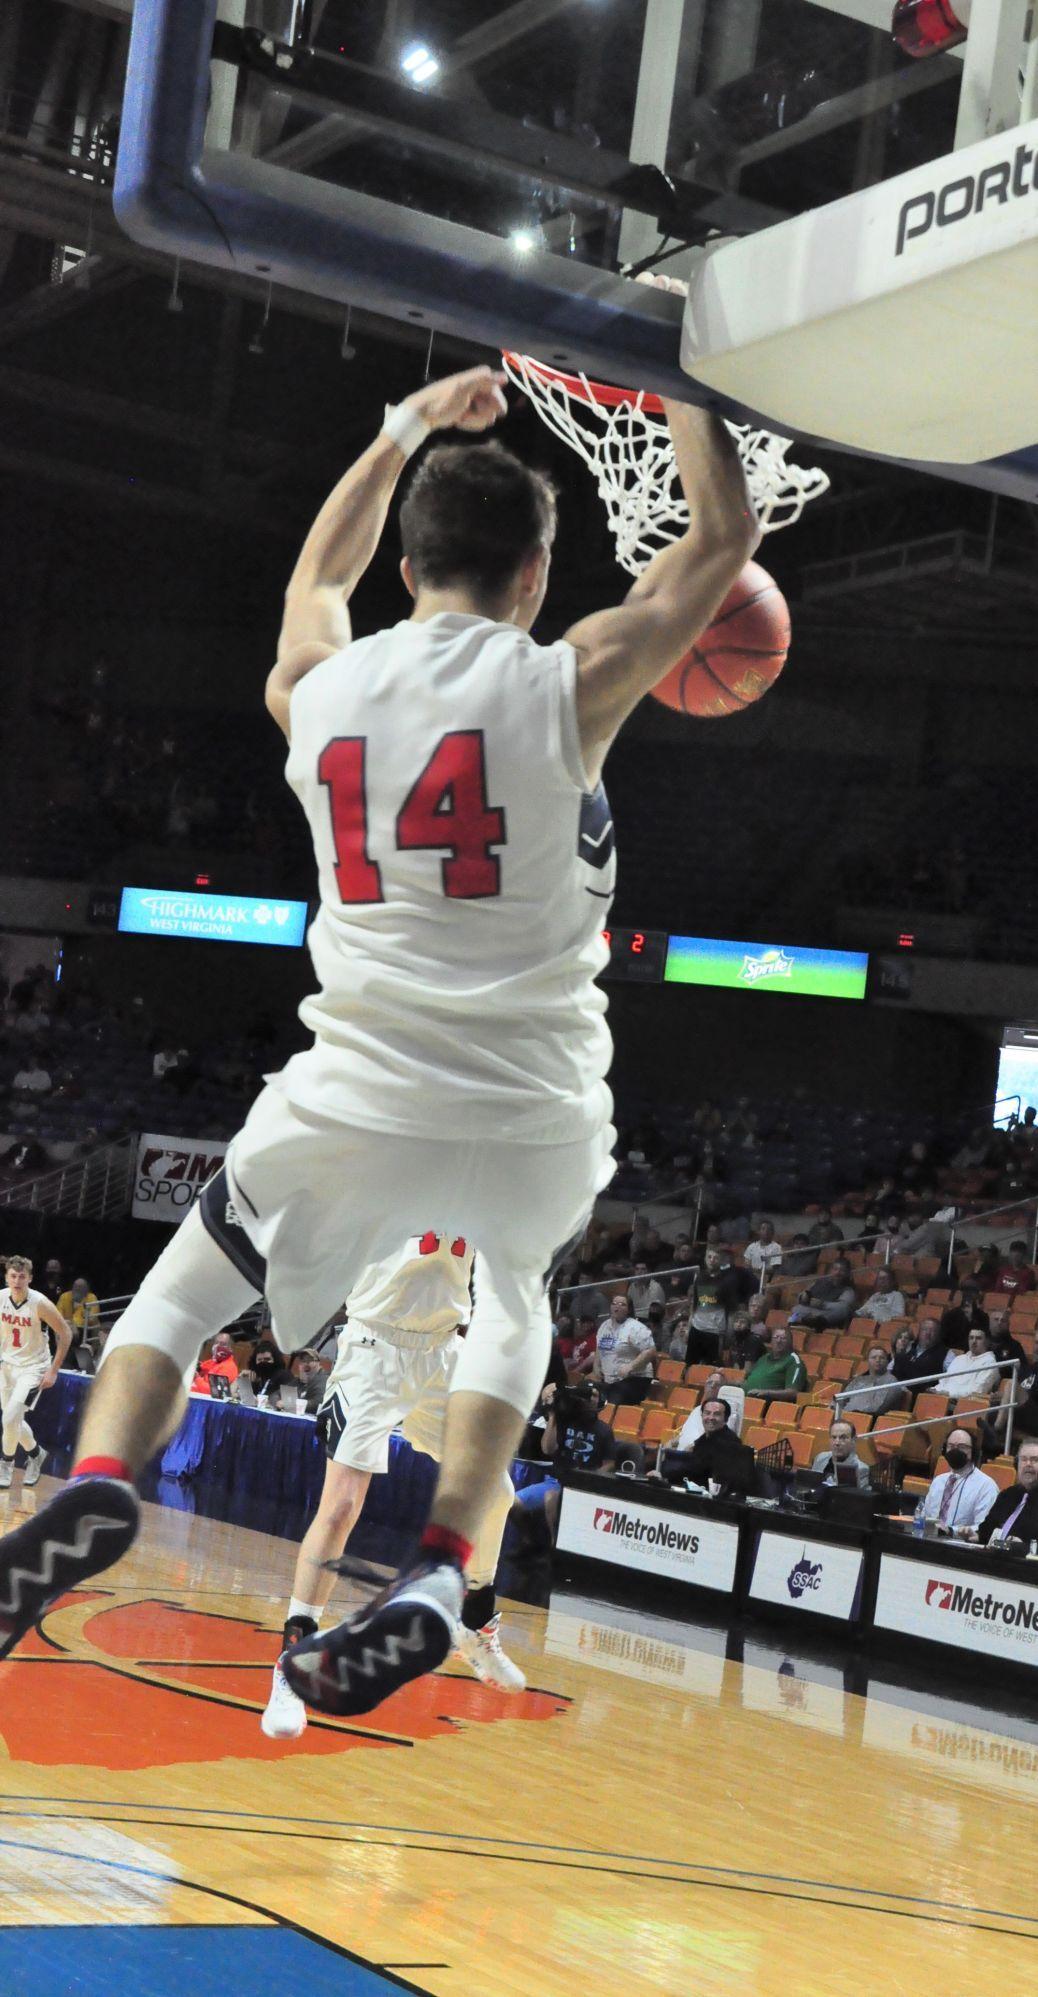 Man PC Austin Ball game clinching dunk